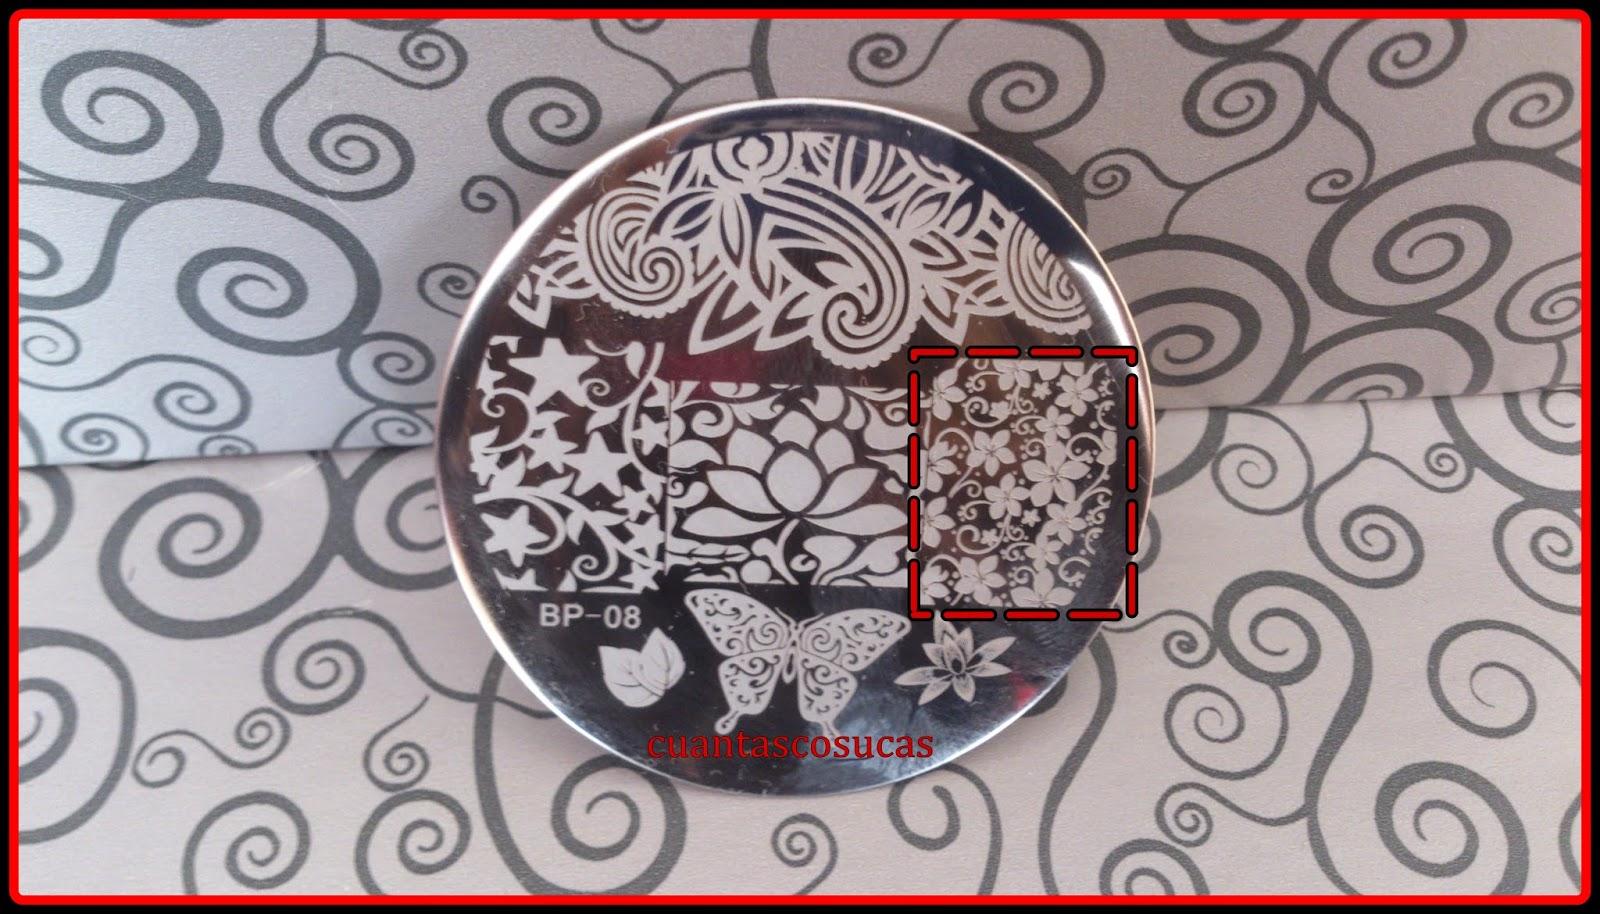 Imagenes De Flores Negras - mi rosa negra imagenes + letra YouTube